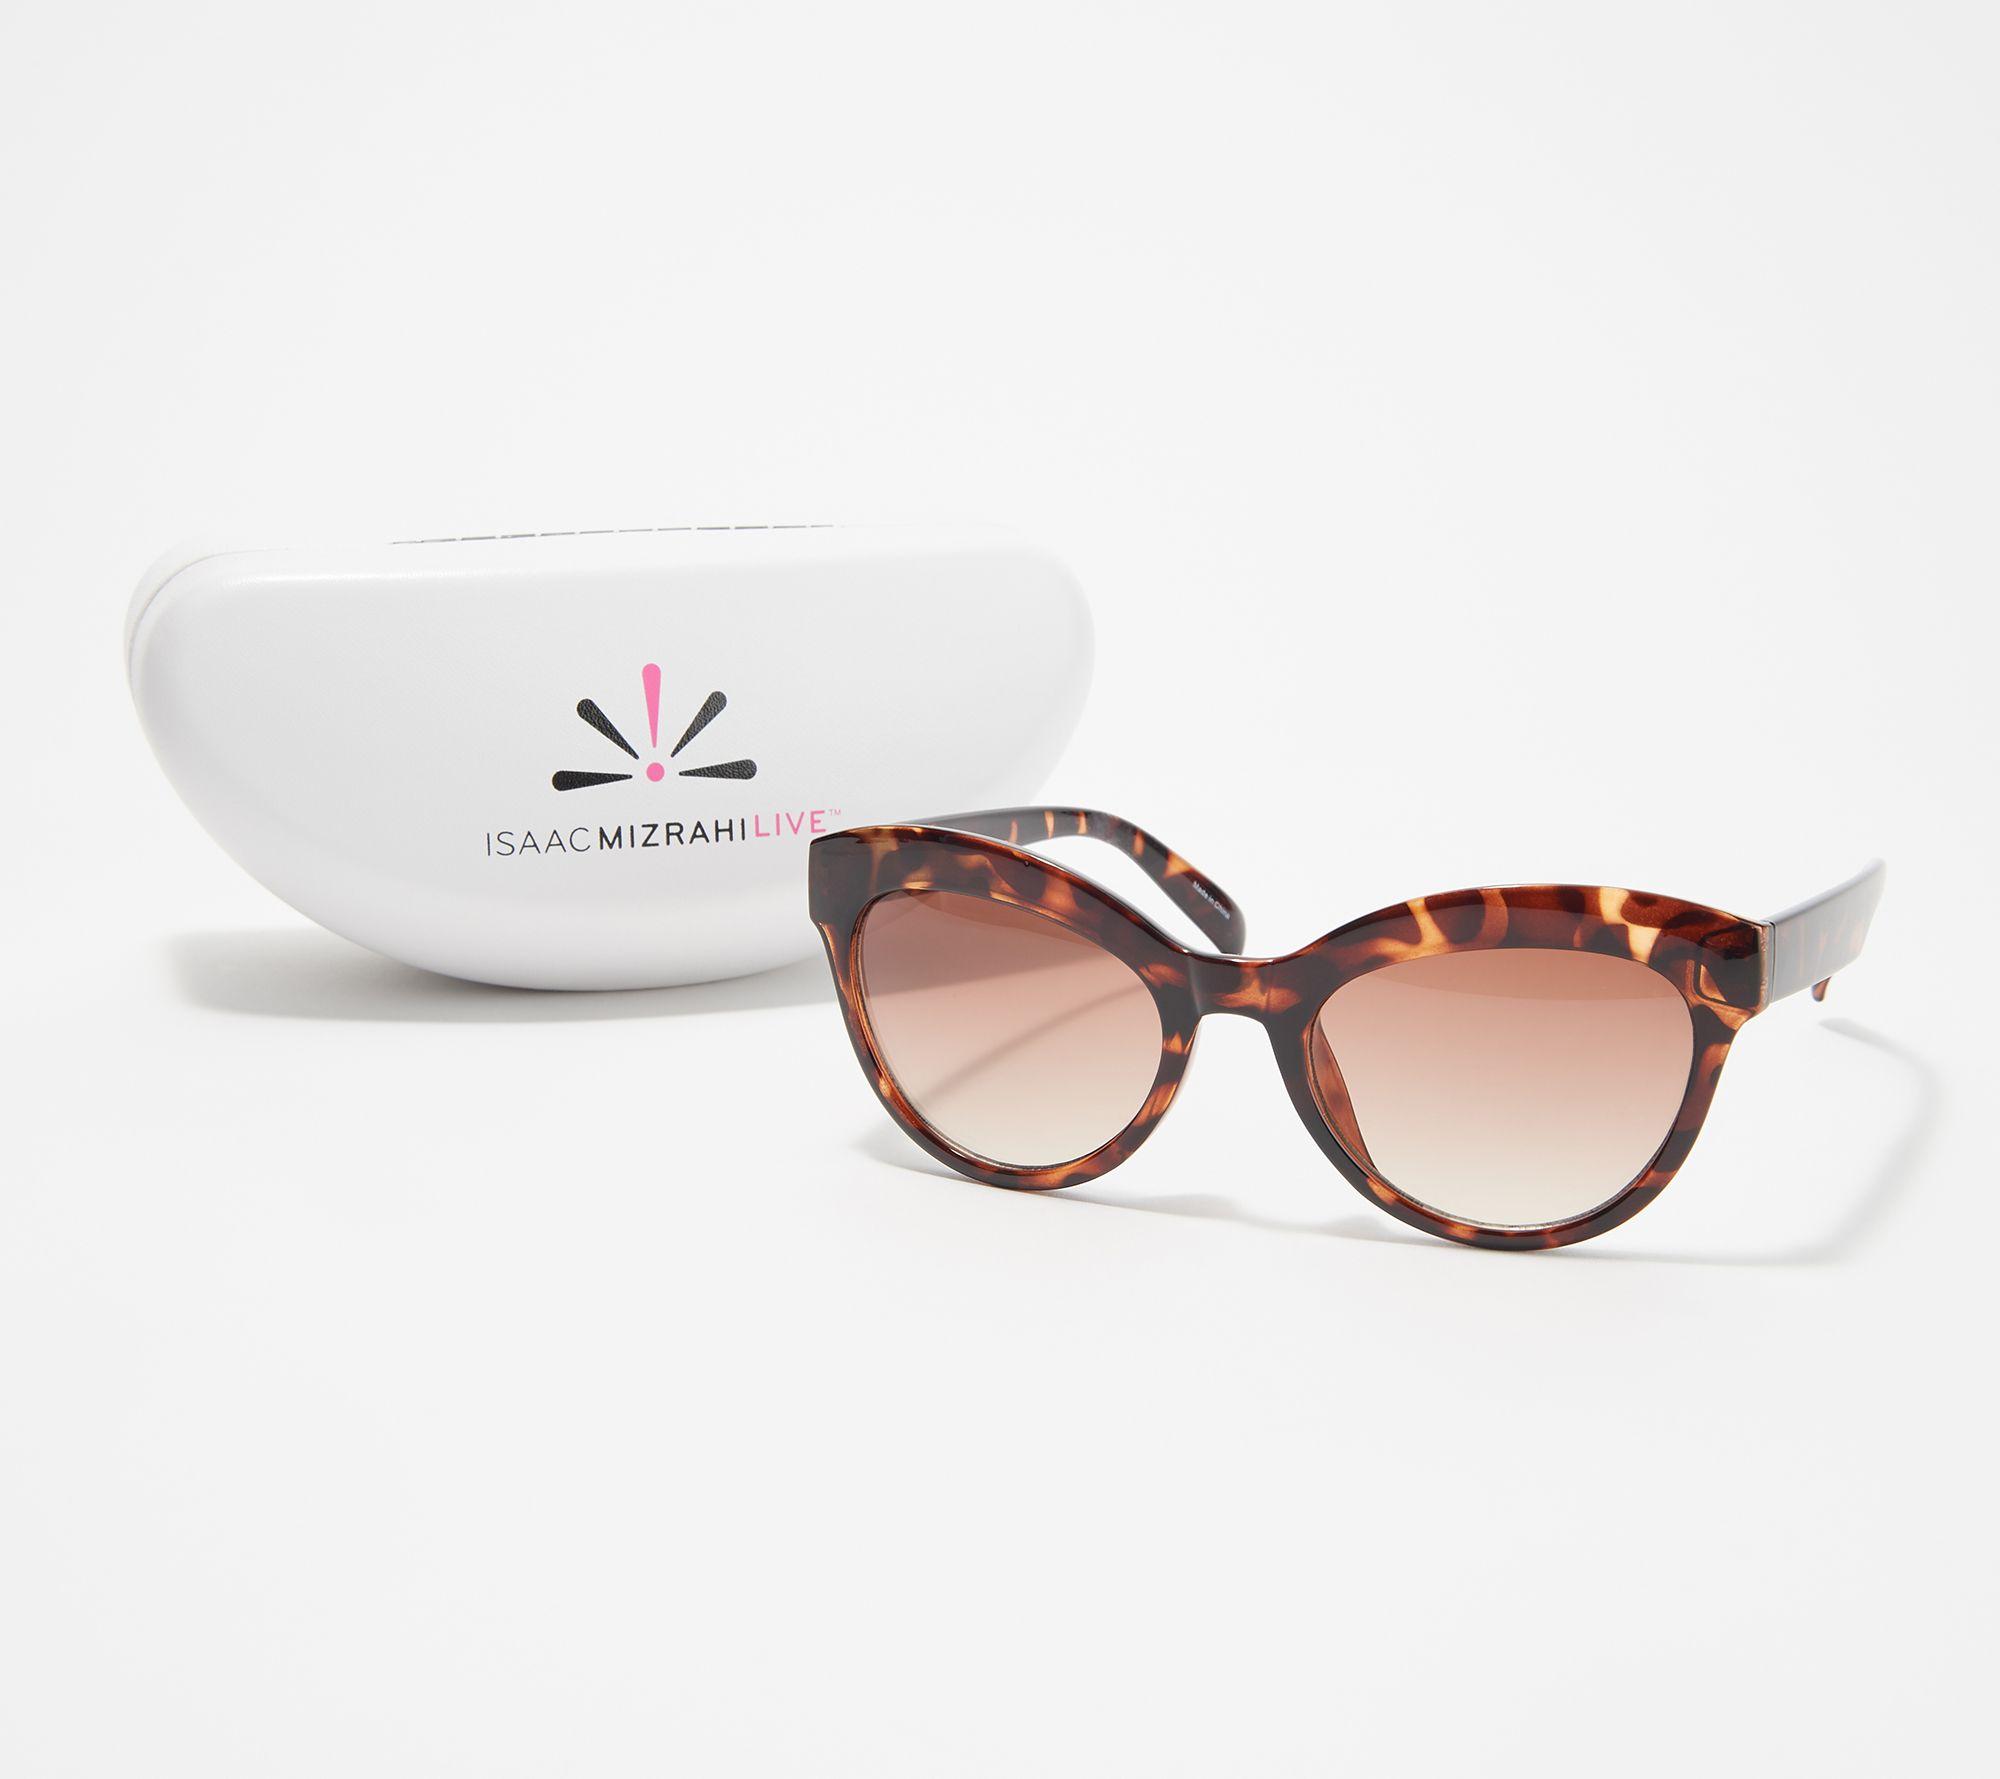 6b3cd9125a Isaac Mizrahi Live! Rounded Cat Eye Sunglasses - Page 1 — QVC.com